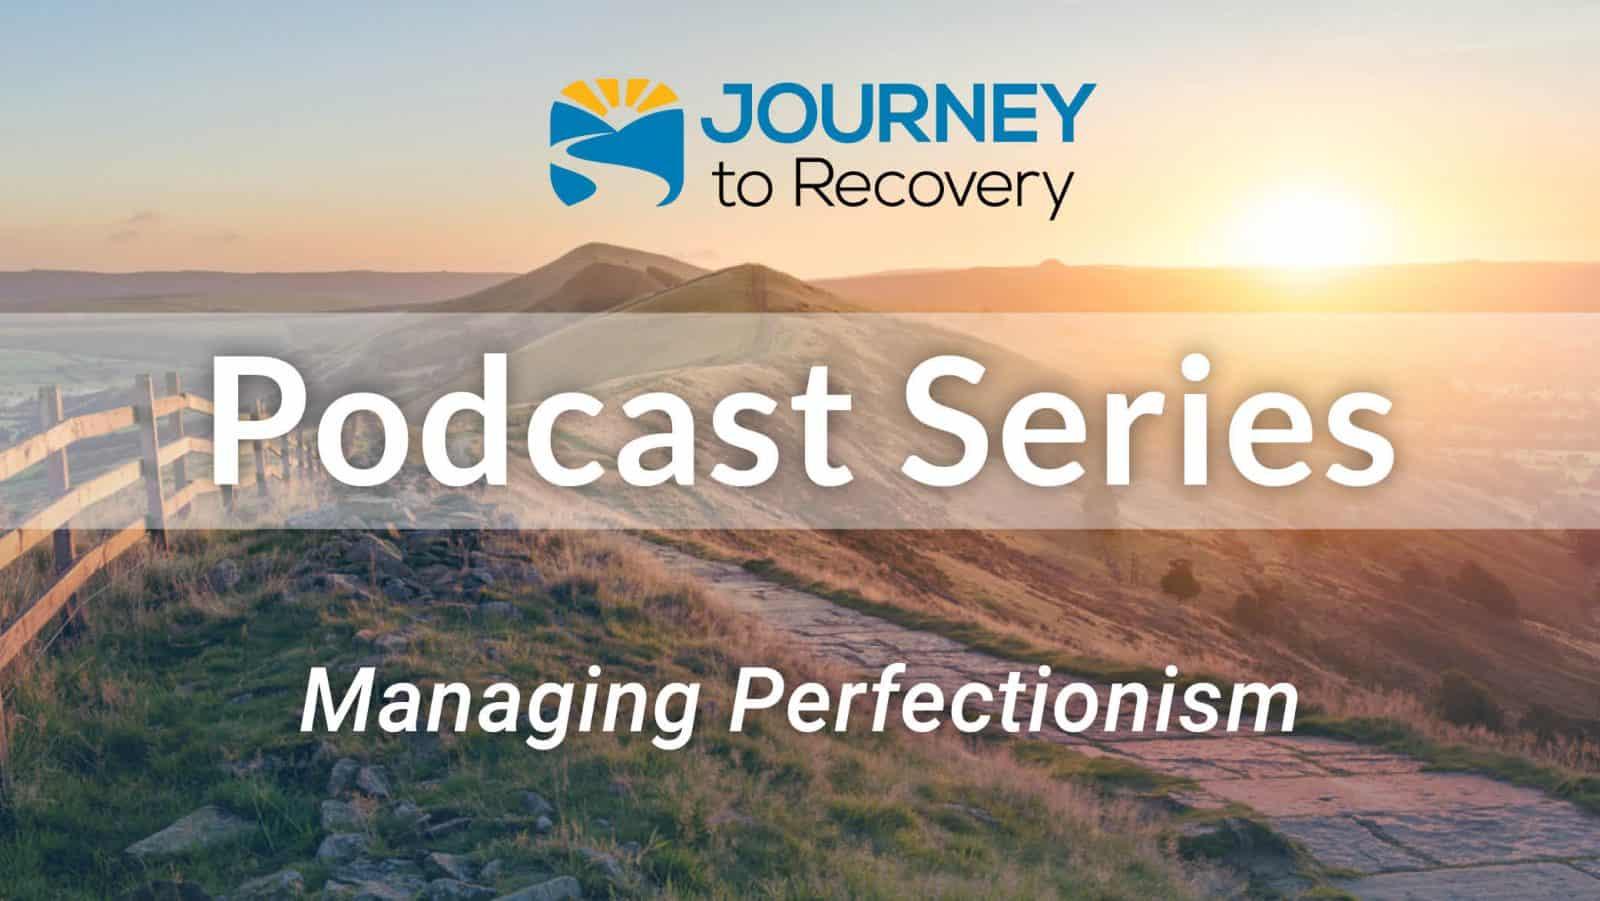 Managing Perfectionism